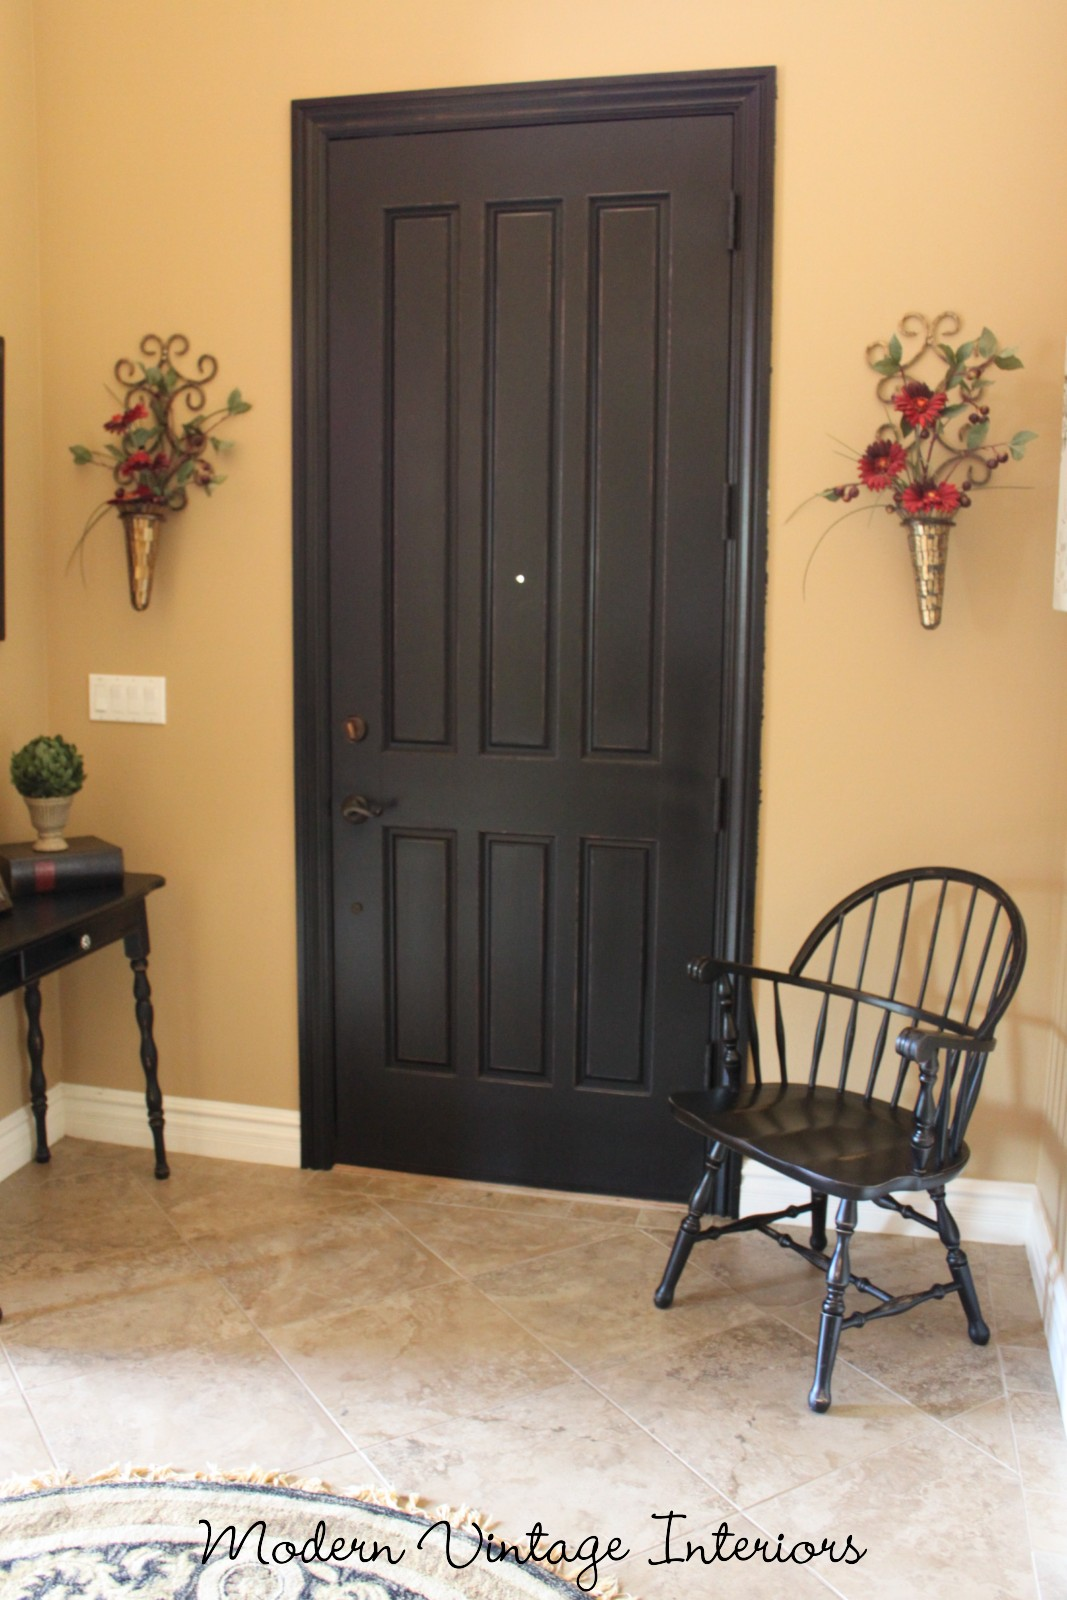 & Remodelaholic | Painting A Wooden Exterior Door Black